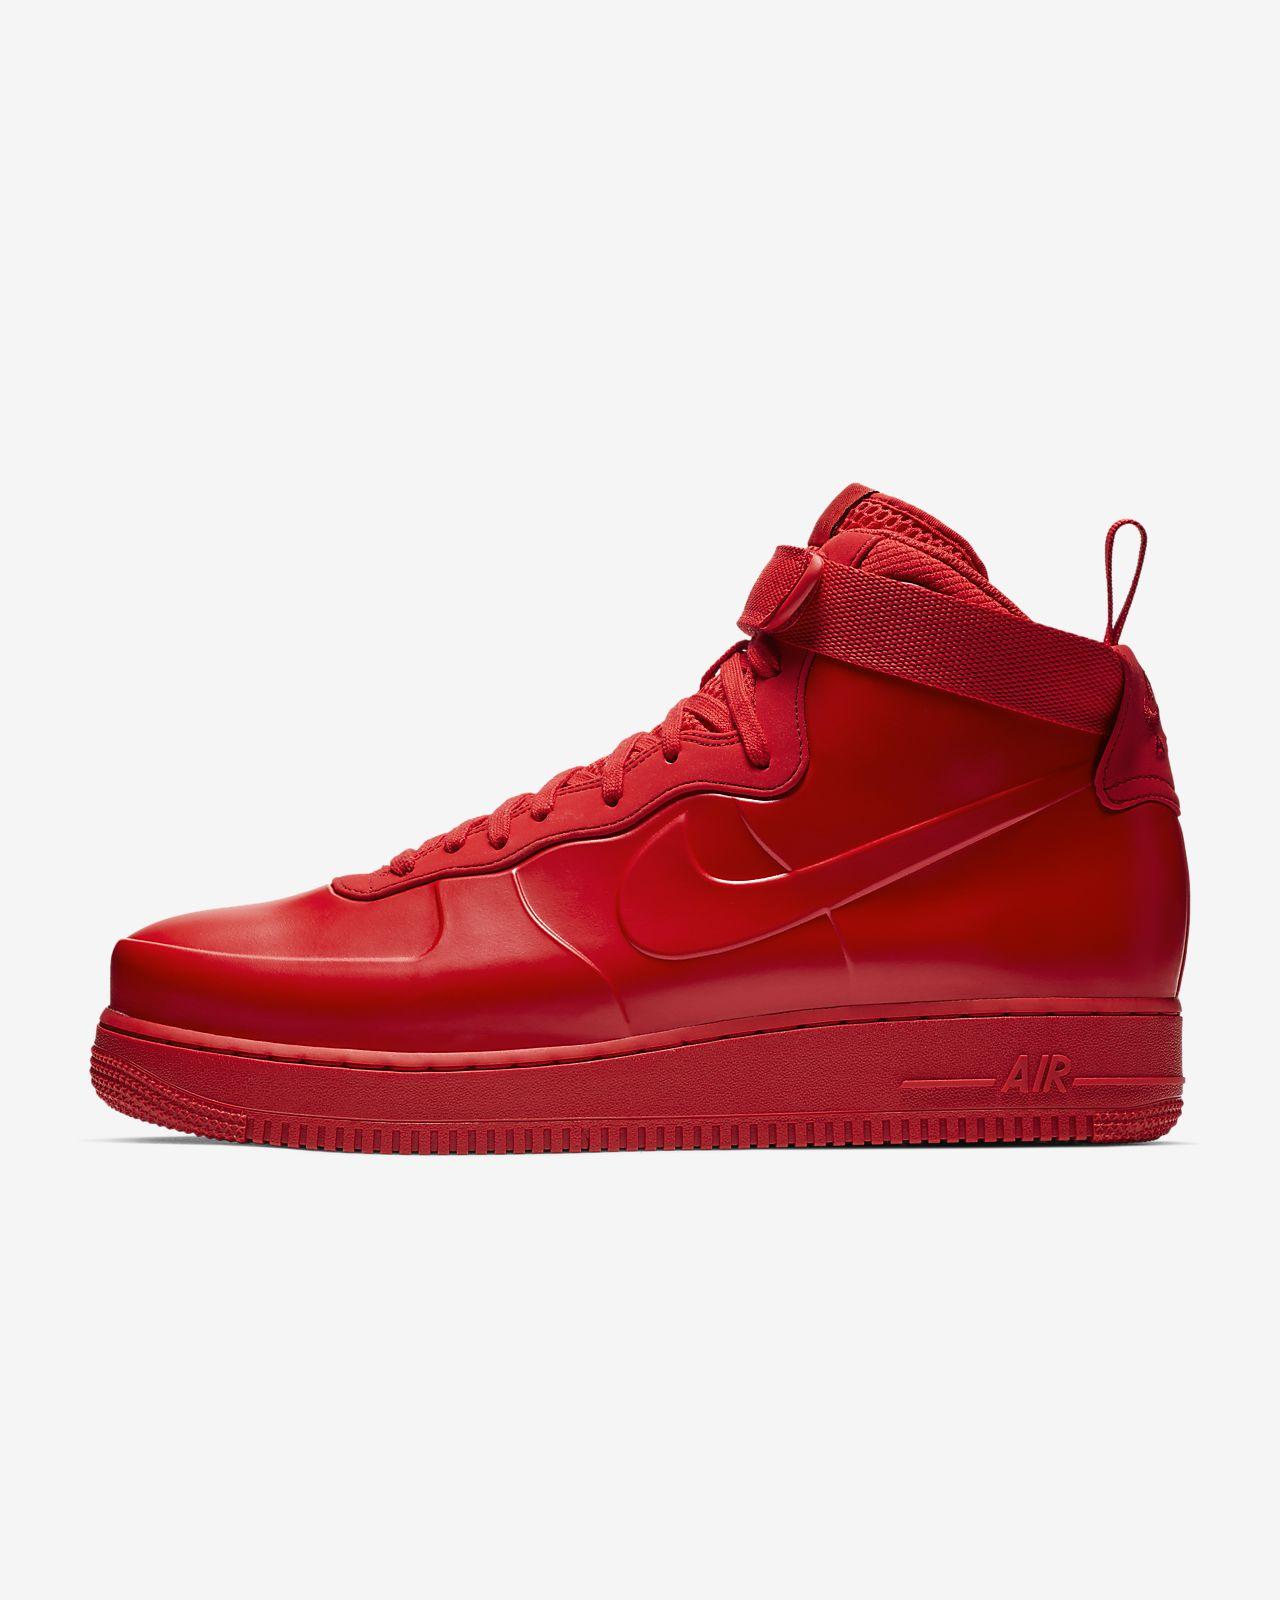 8accffc95603df Nike Air Force 1 Foamposite Cupsole Men s Shoe. Nike.com